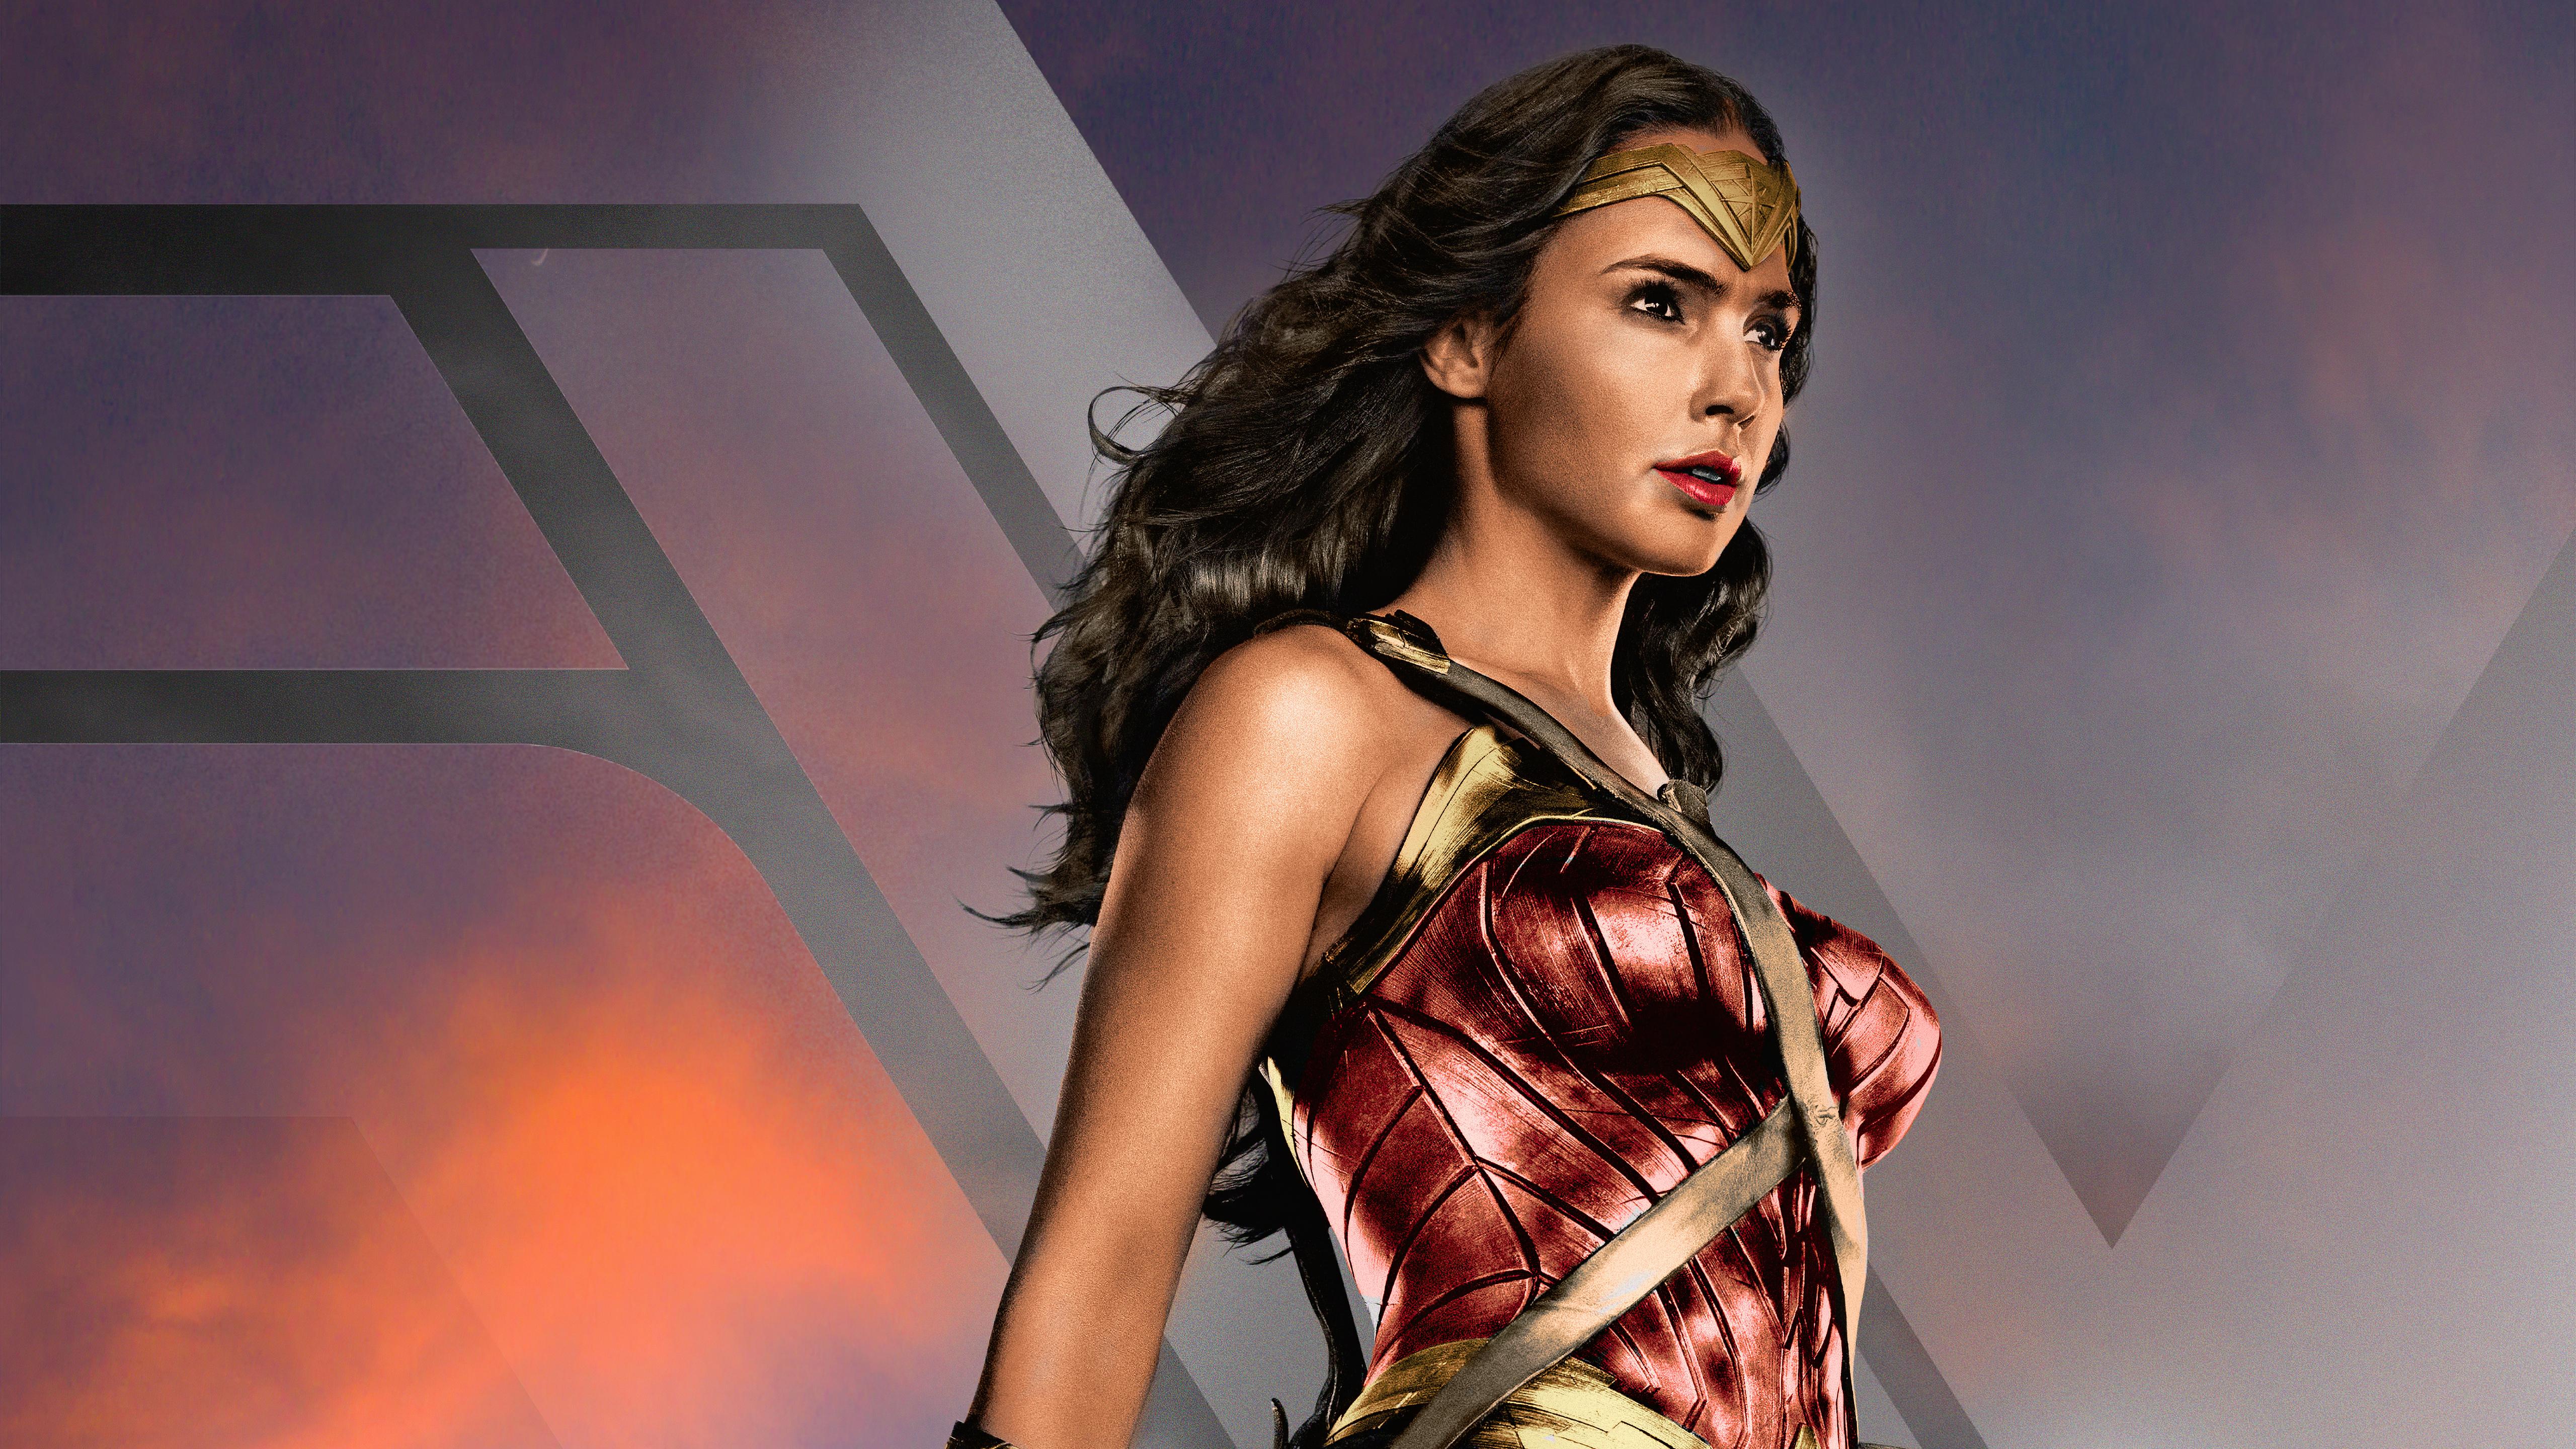 wonder woman zack snyder justice league 4k 1618166064 - Wonder Woman Zack Snyder Justice League 4k - Wonder Woman Zack Snyder Justice League 4k wallpapers